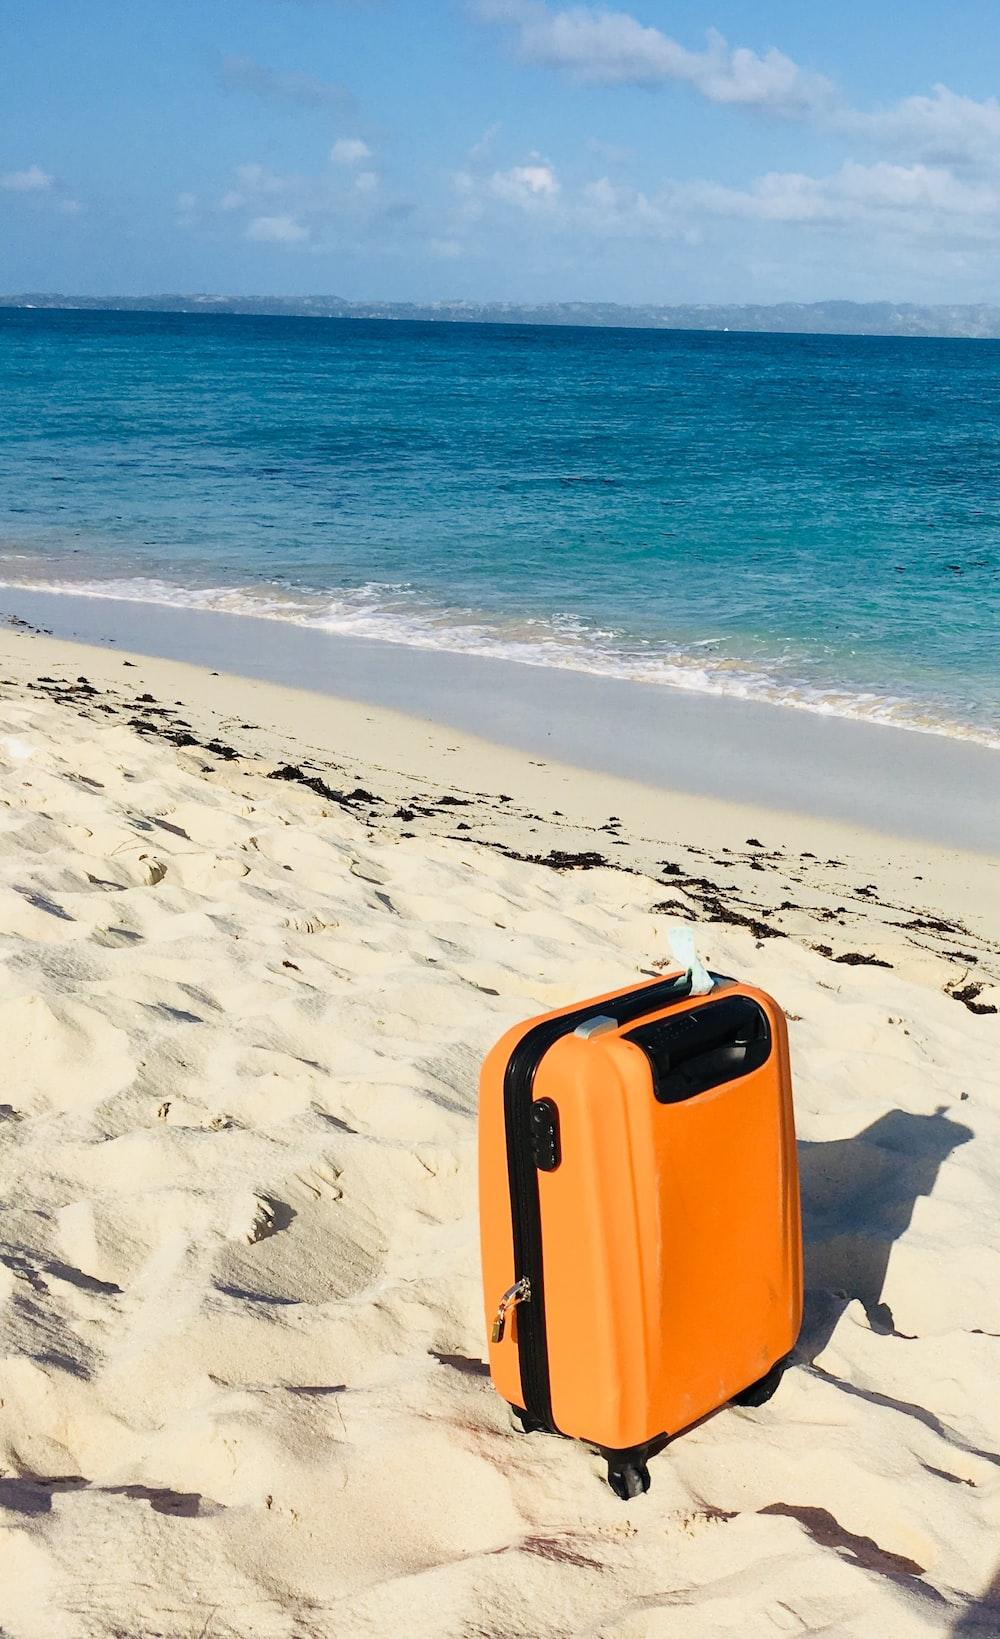 orange and white luggage bag on beach